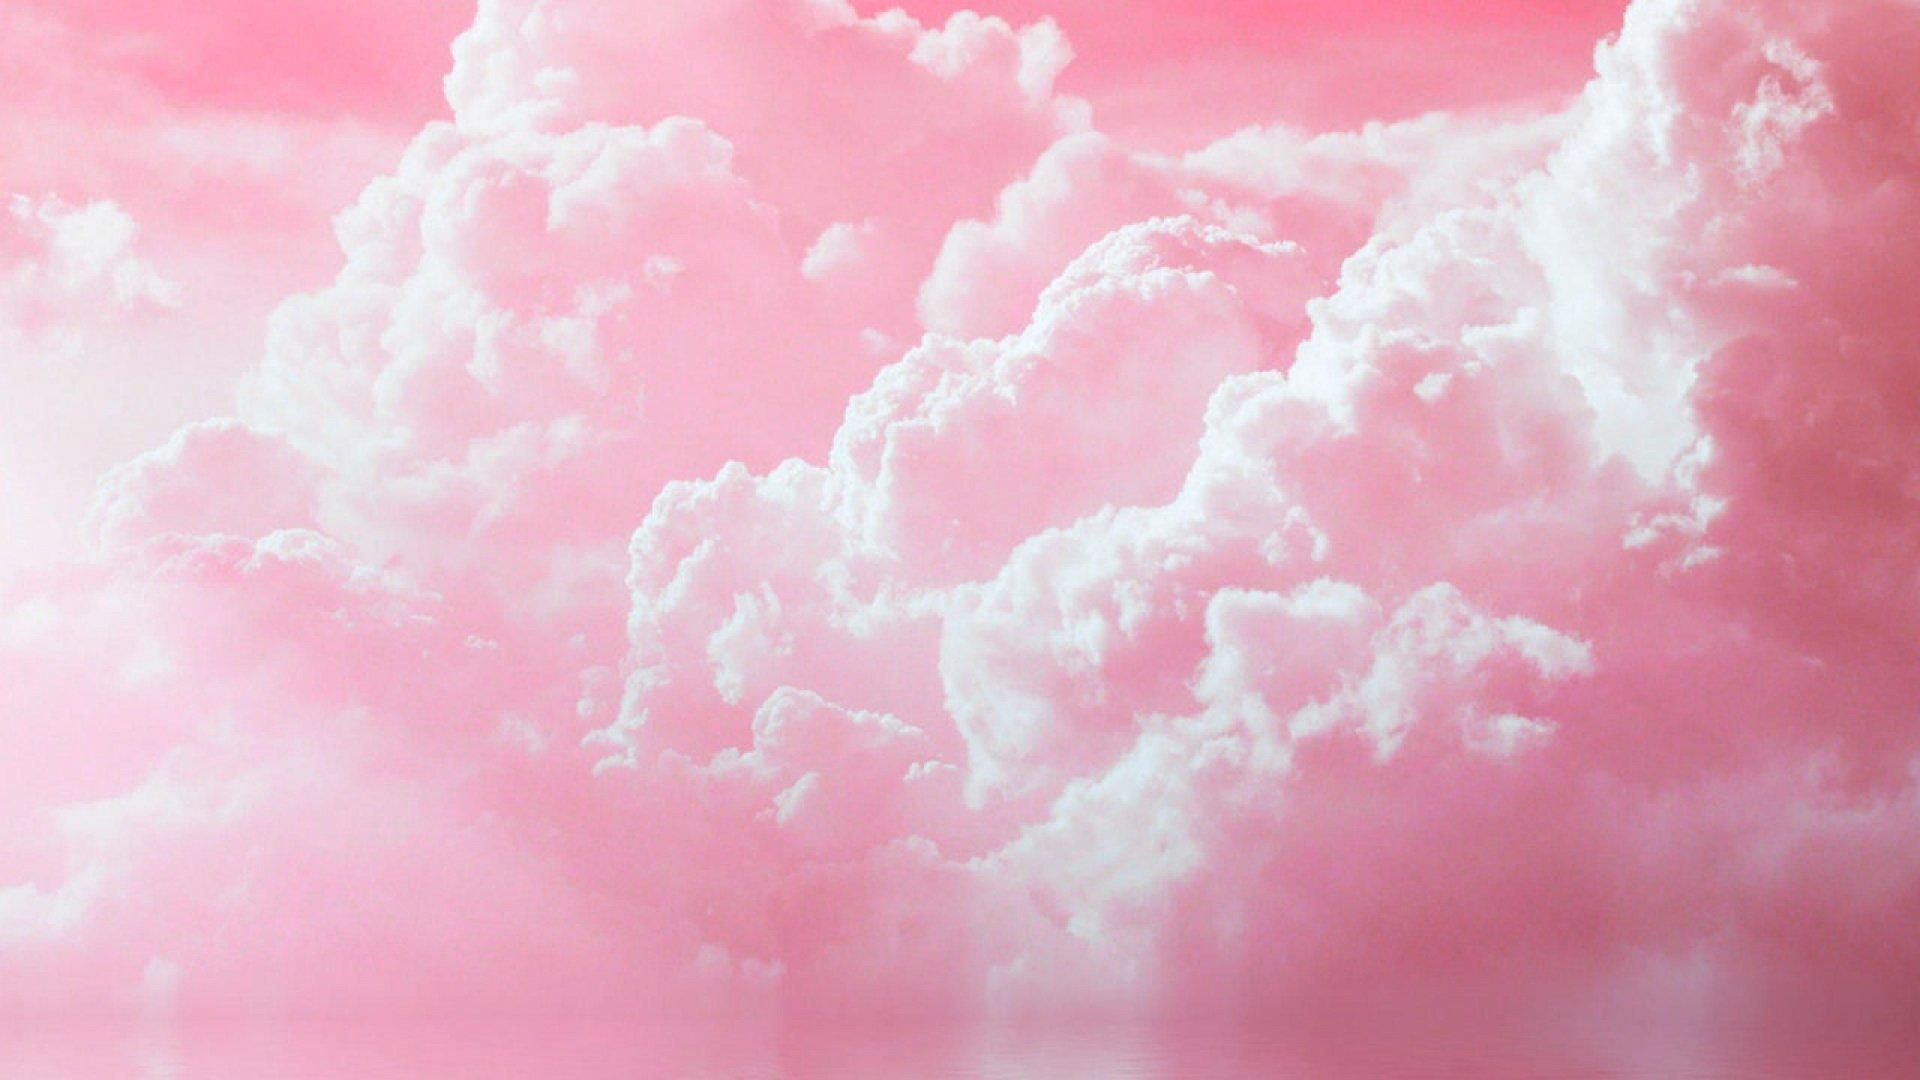 Pastel Aesthetic Wallpaper Free